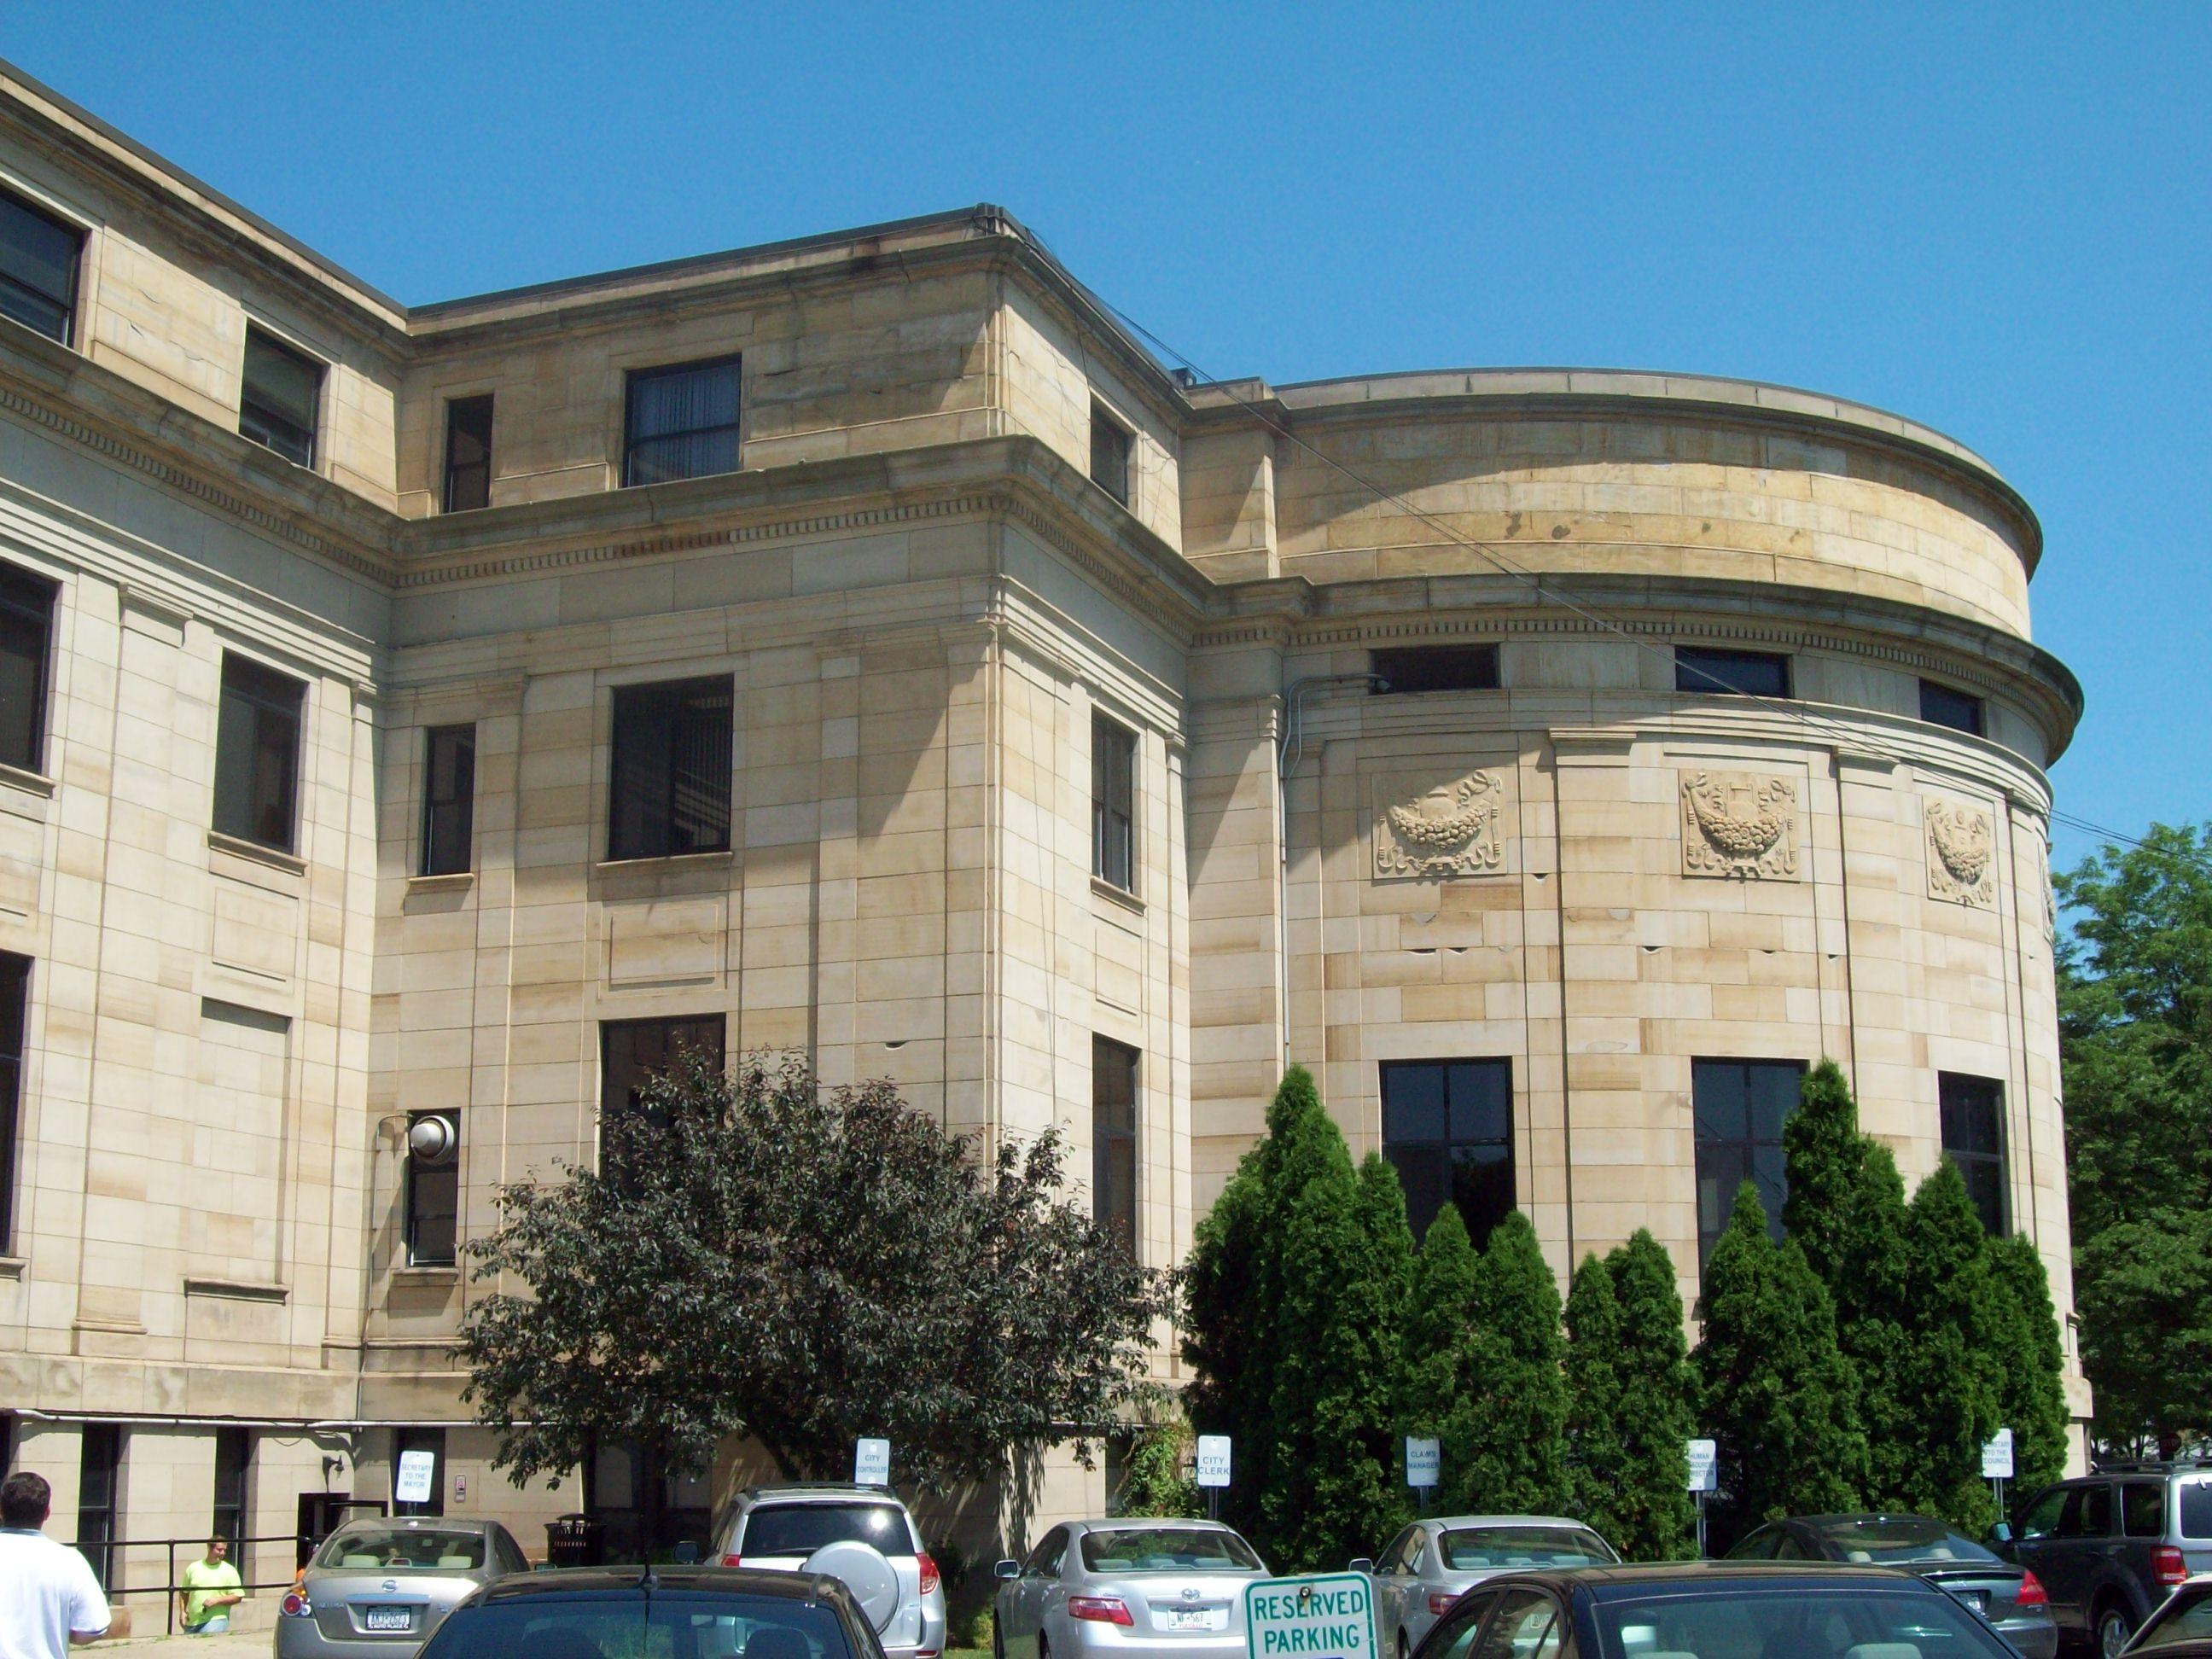 File:Niagara Falls City Hall Rear Jun 09.JPG - Wikimedia Commonsfalls city city